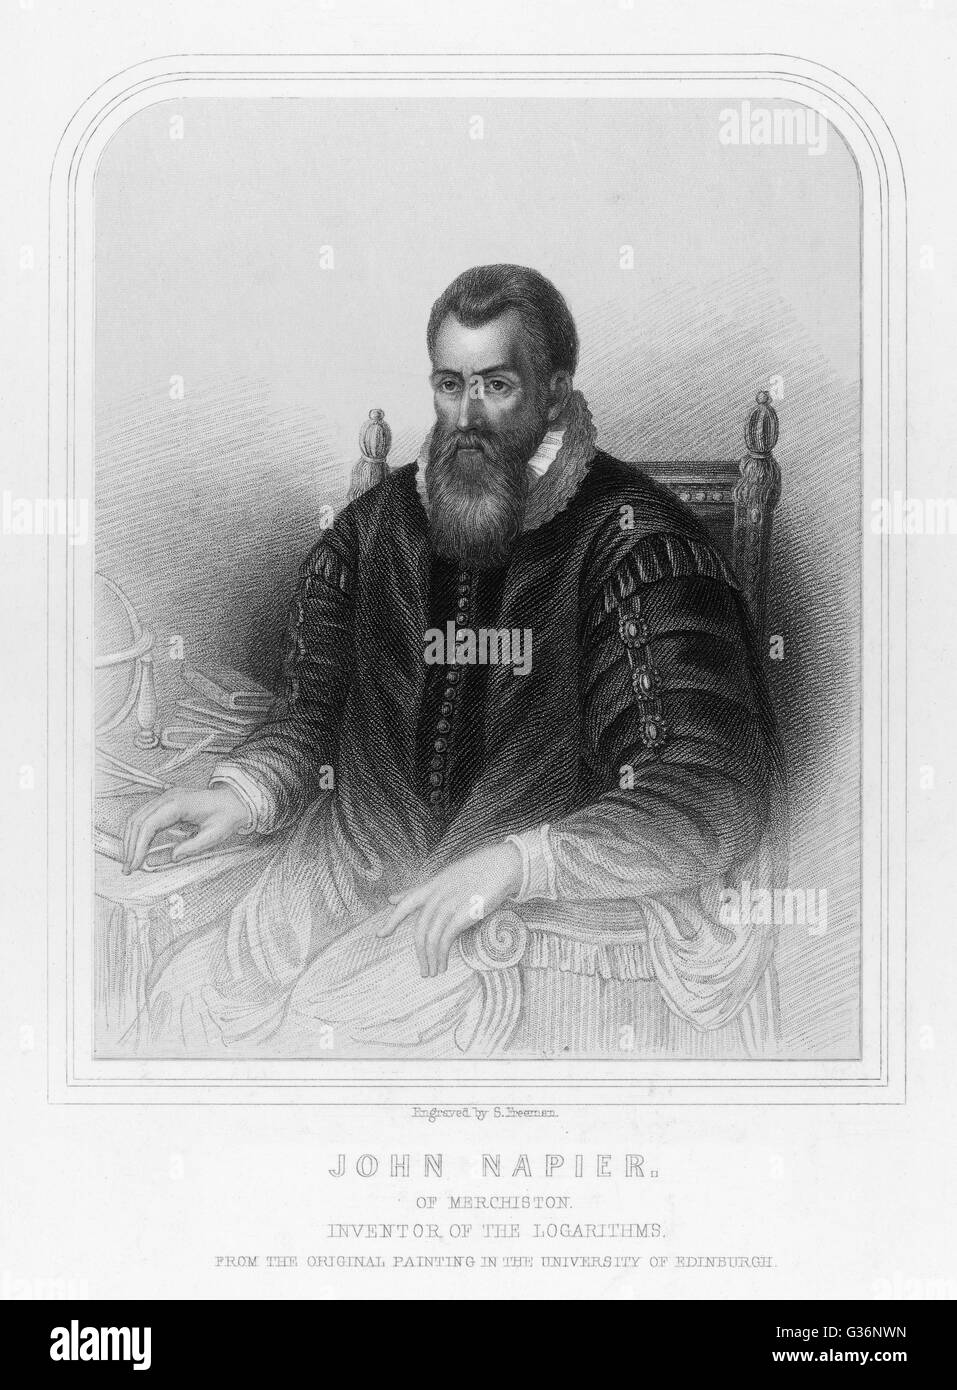 john napier of merchiston